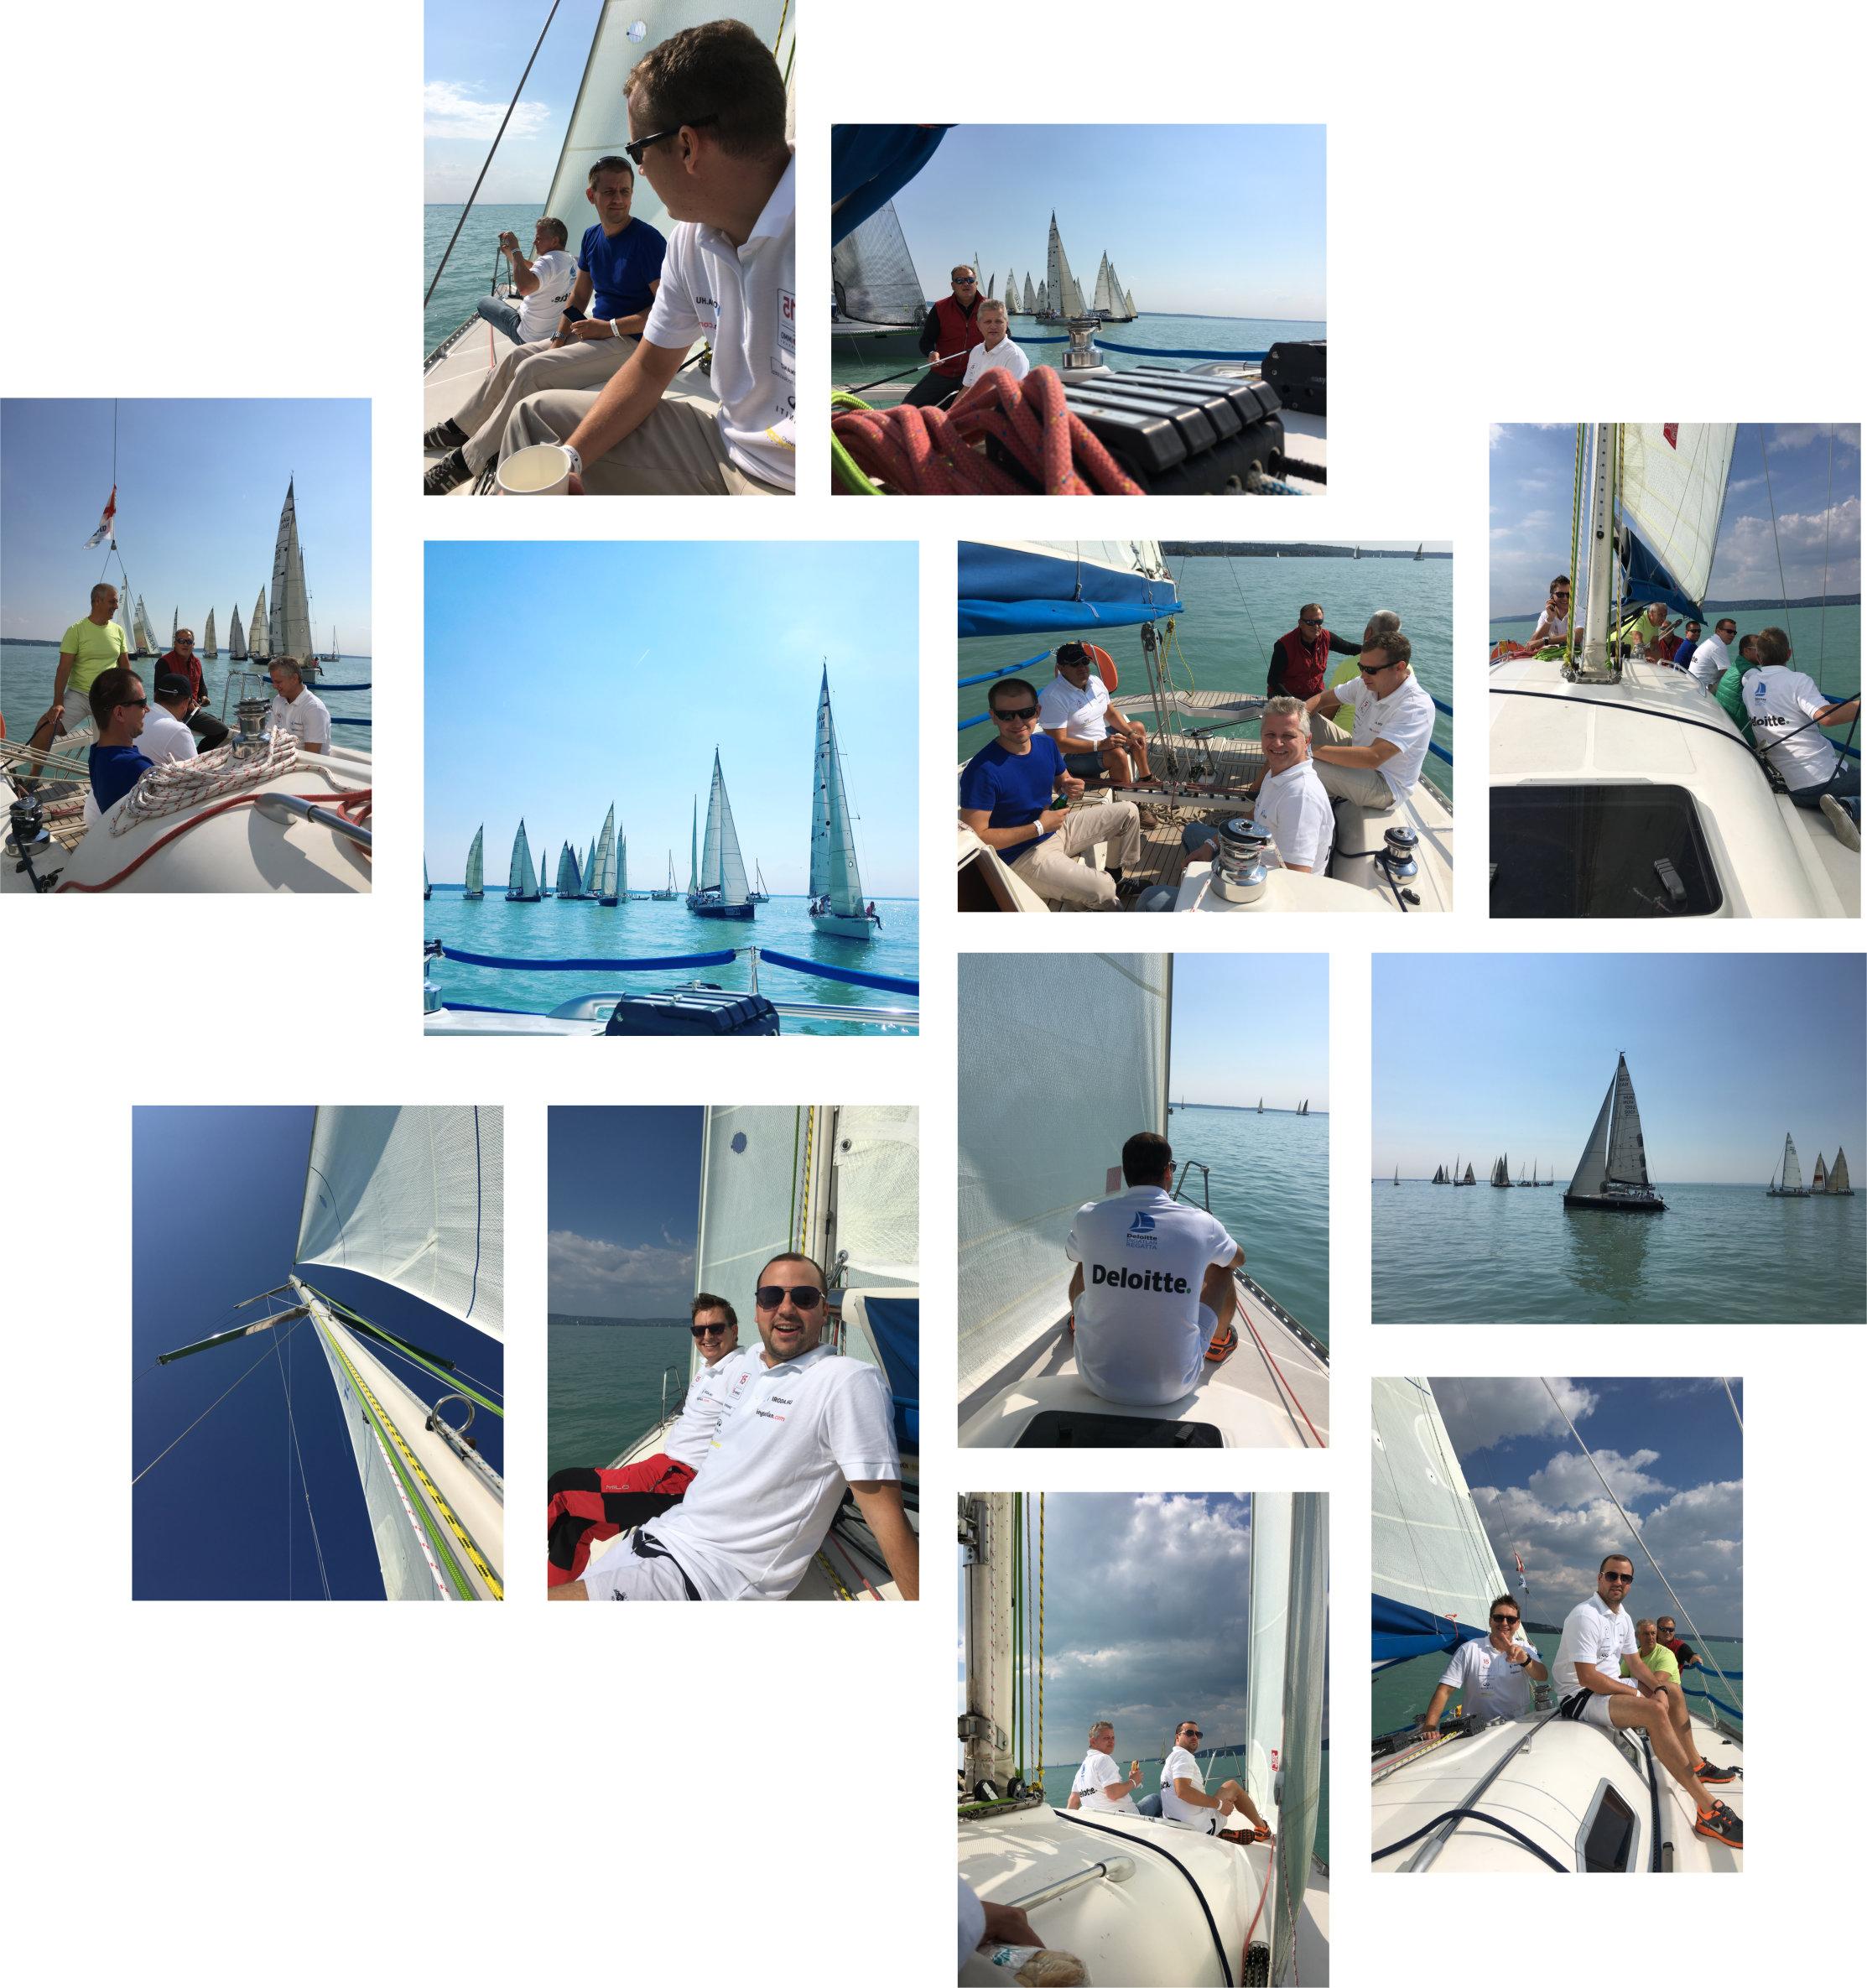 regatta_allinproperty.jpg